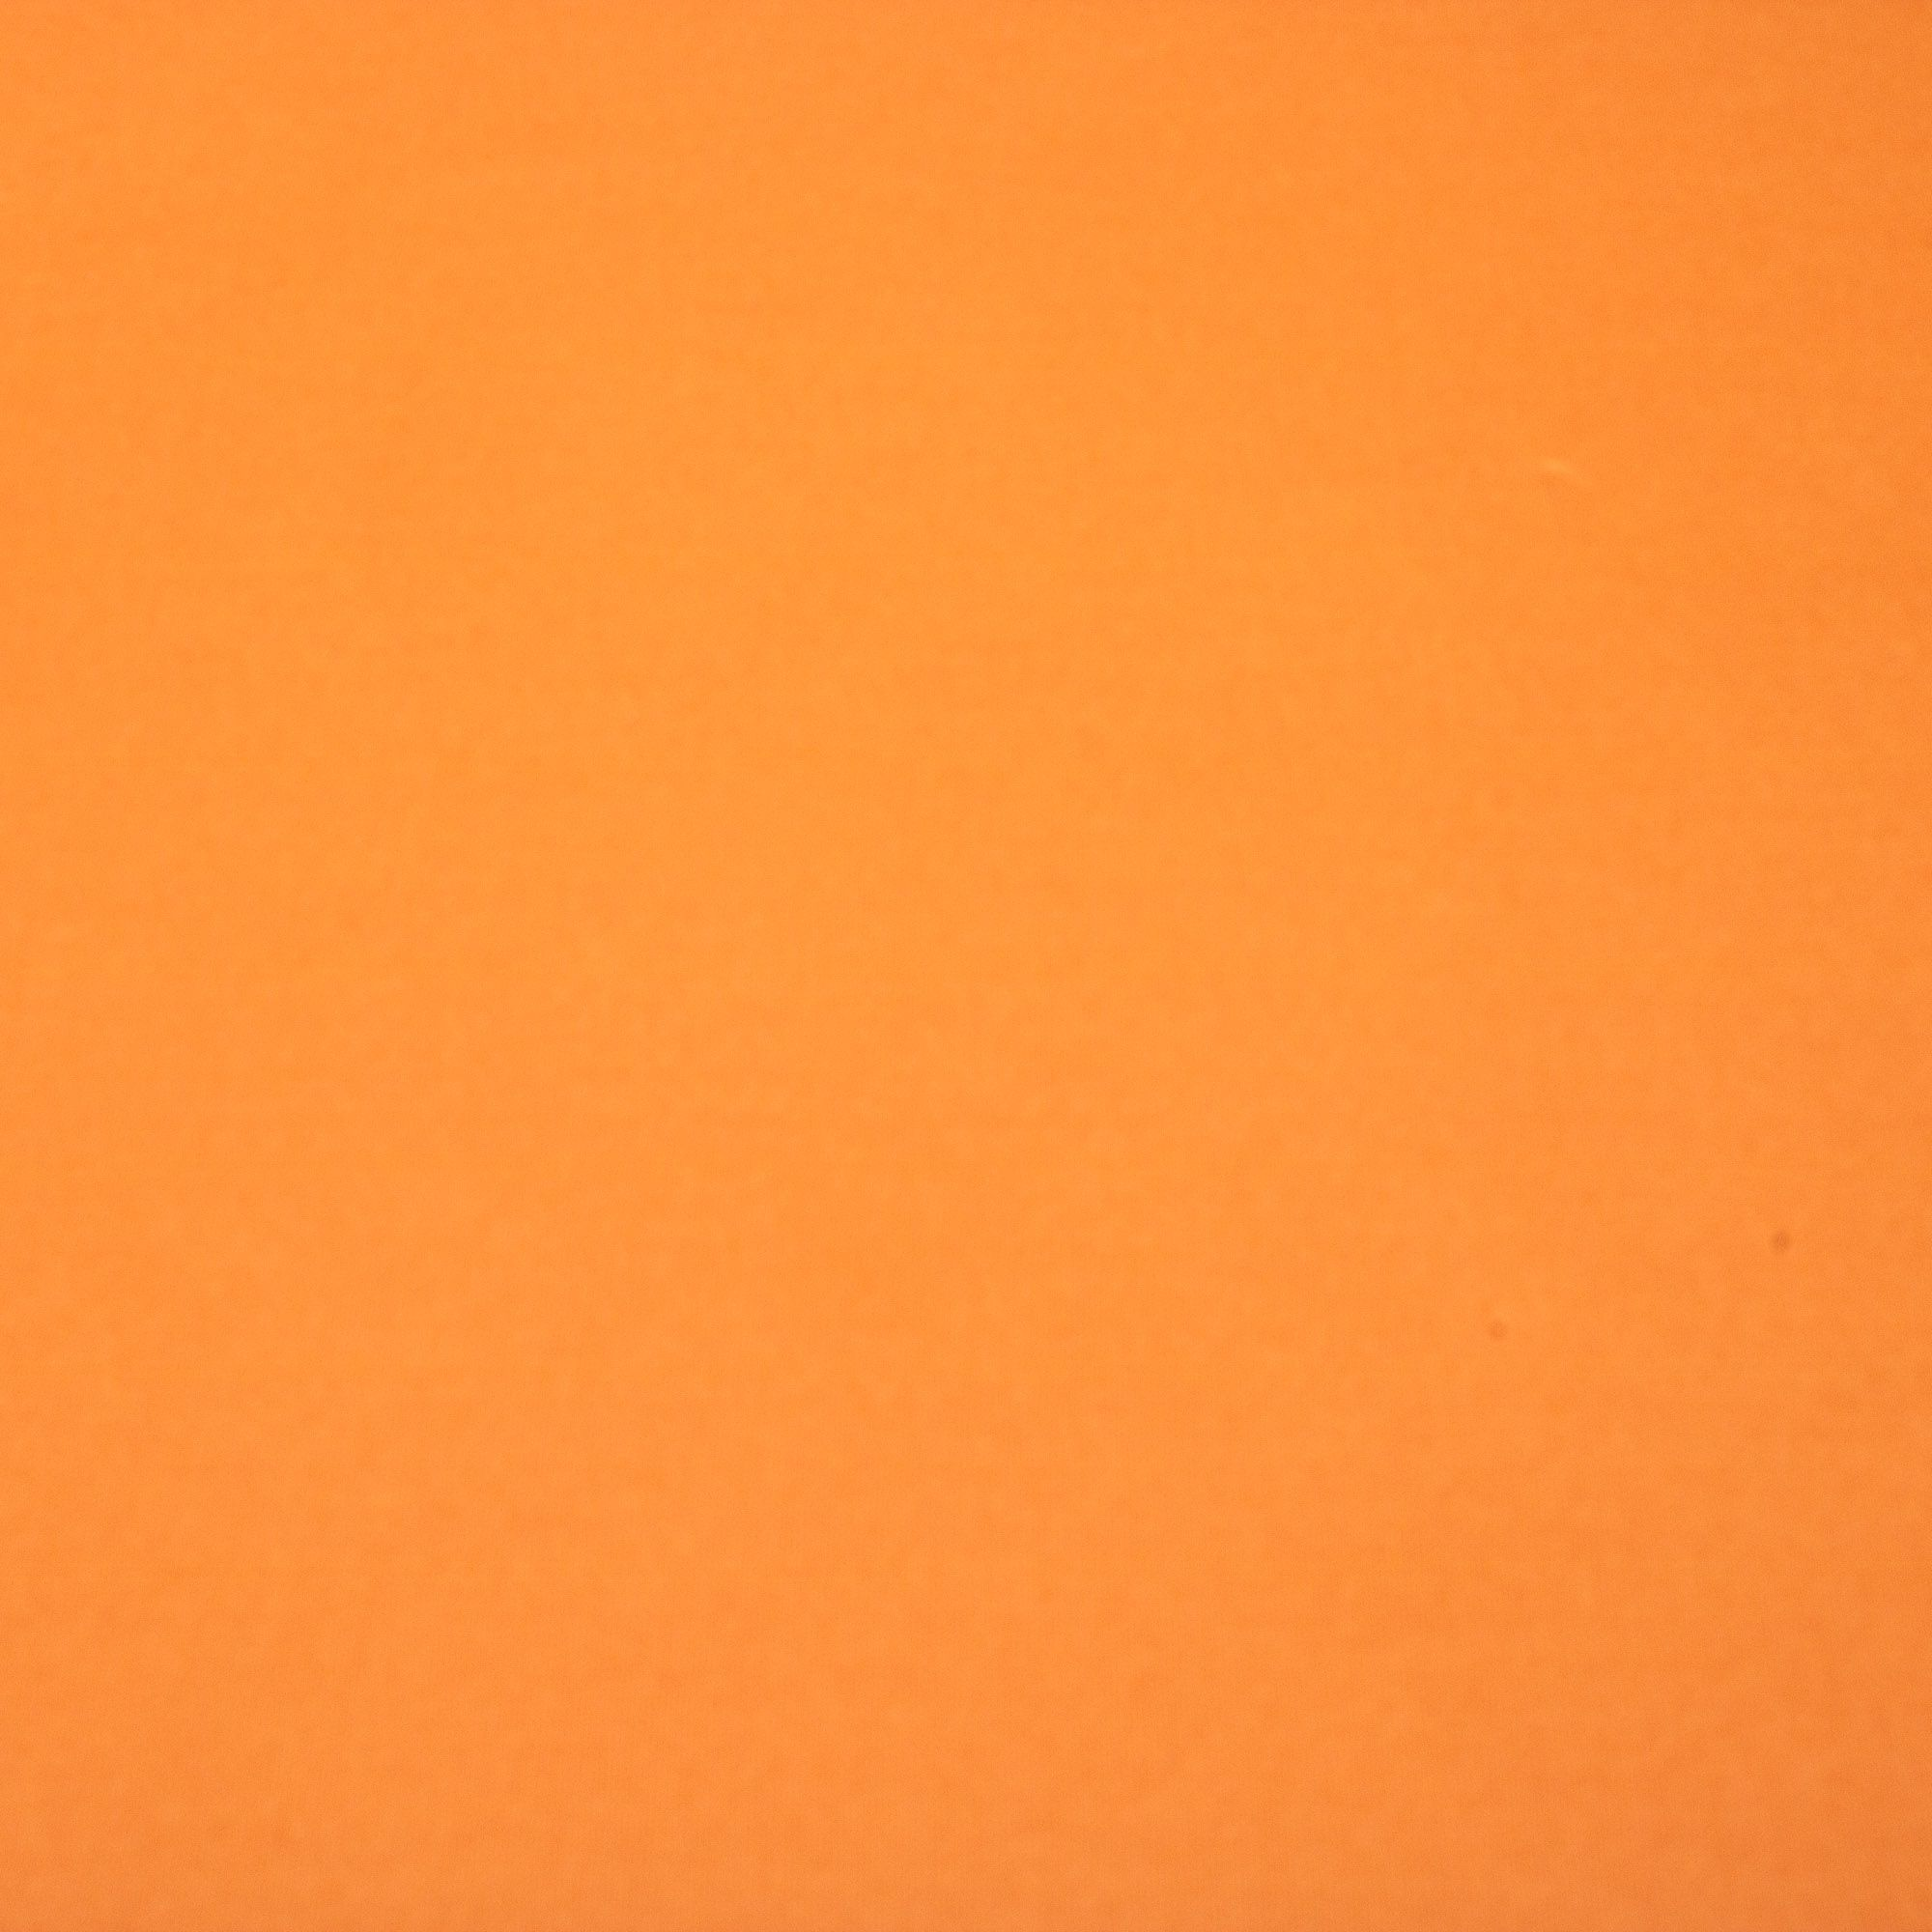 Tecido Malha Helanca Light Laranja 100% Poliester 1,80 m Largura